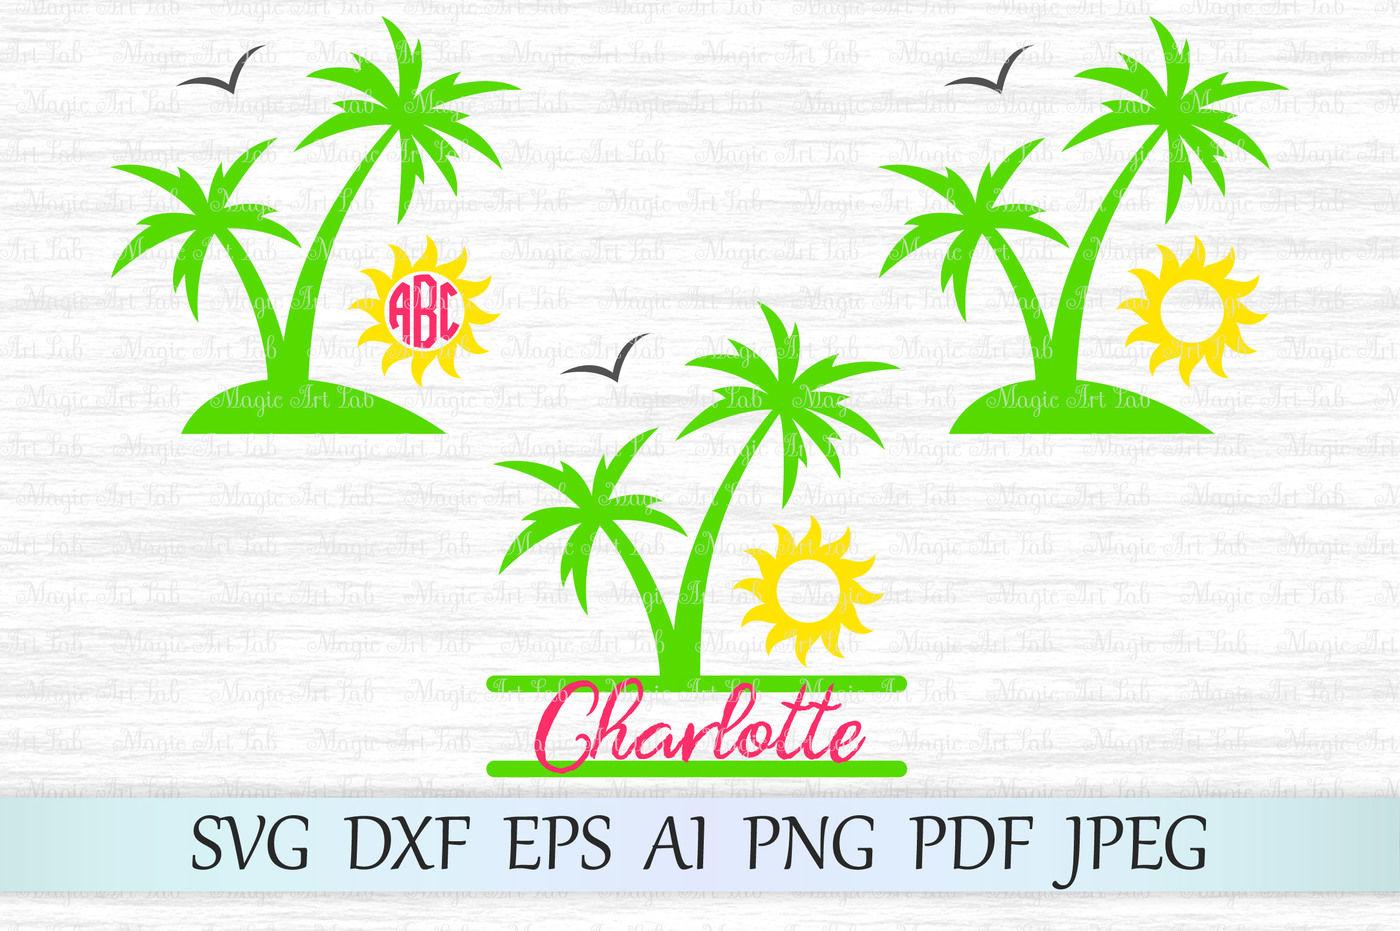 Palm Palm Tree Svg Dxf Eps Ai Png Pdf By Magicartlab